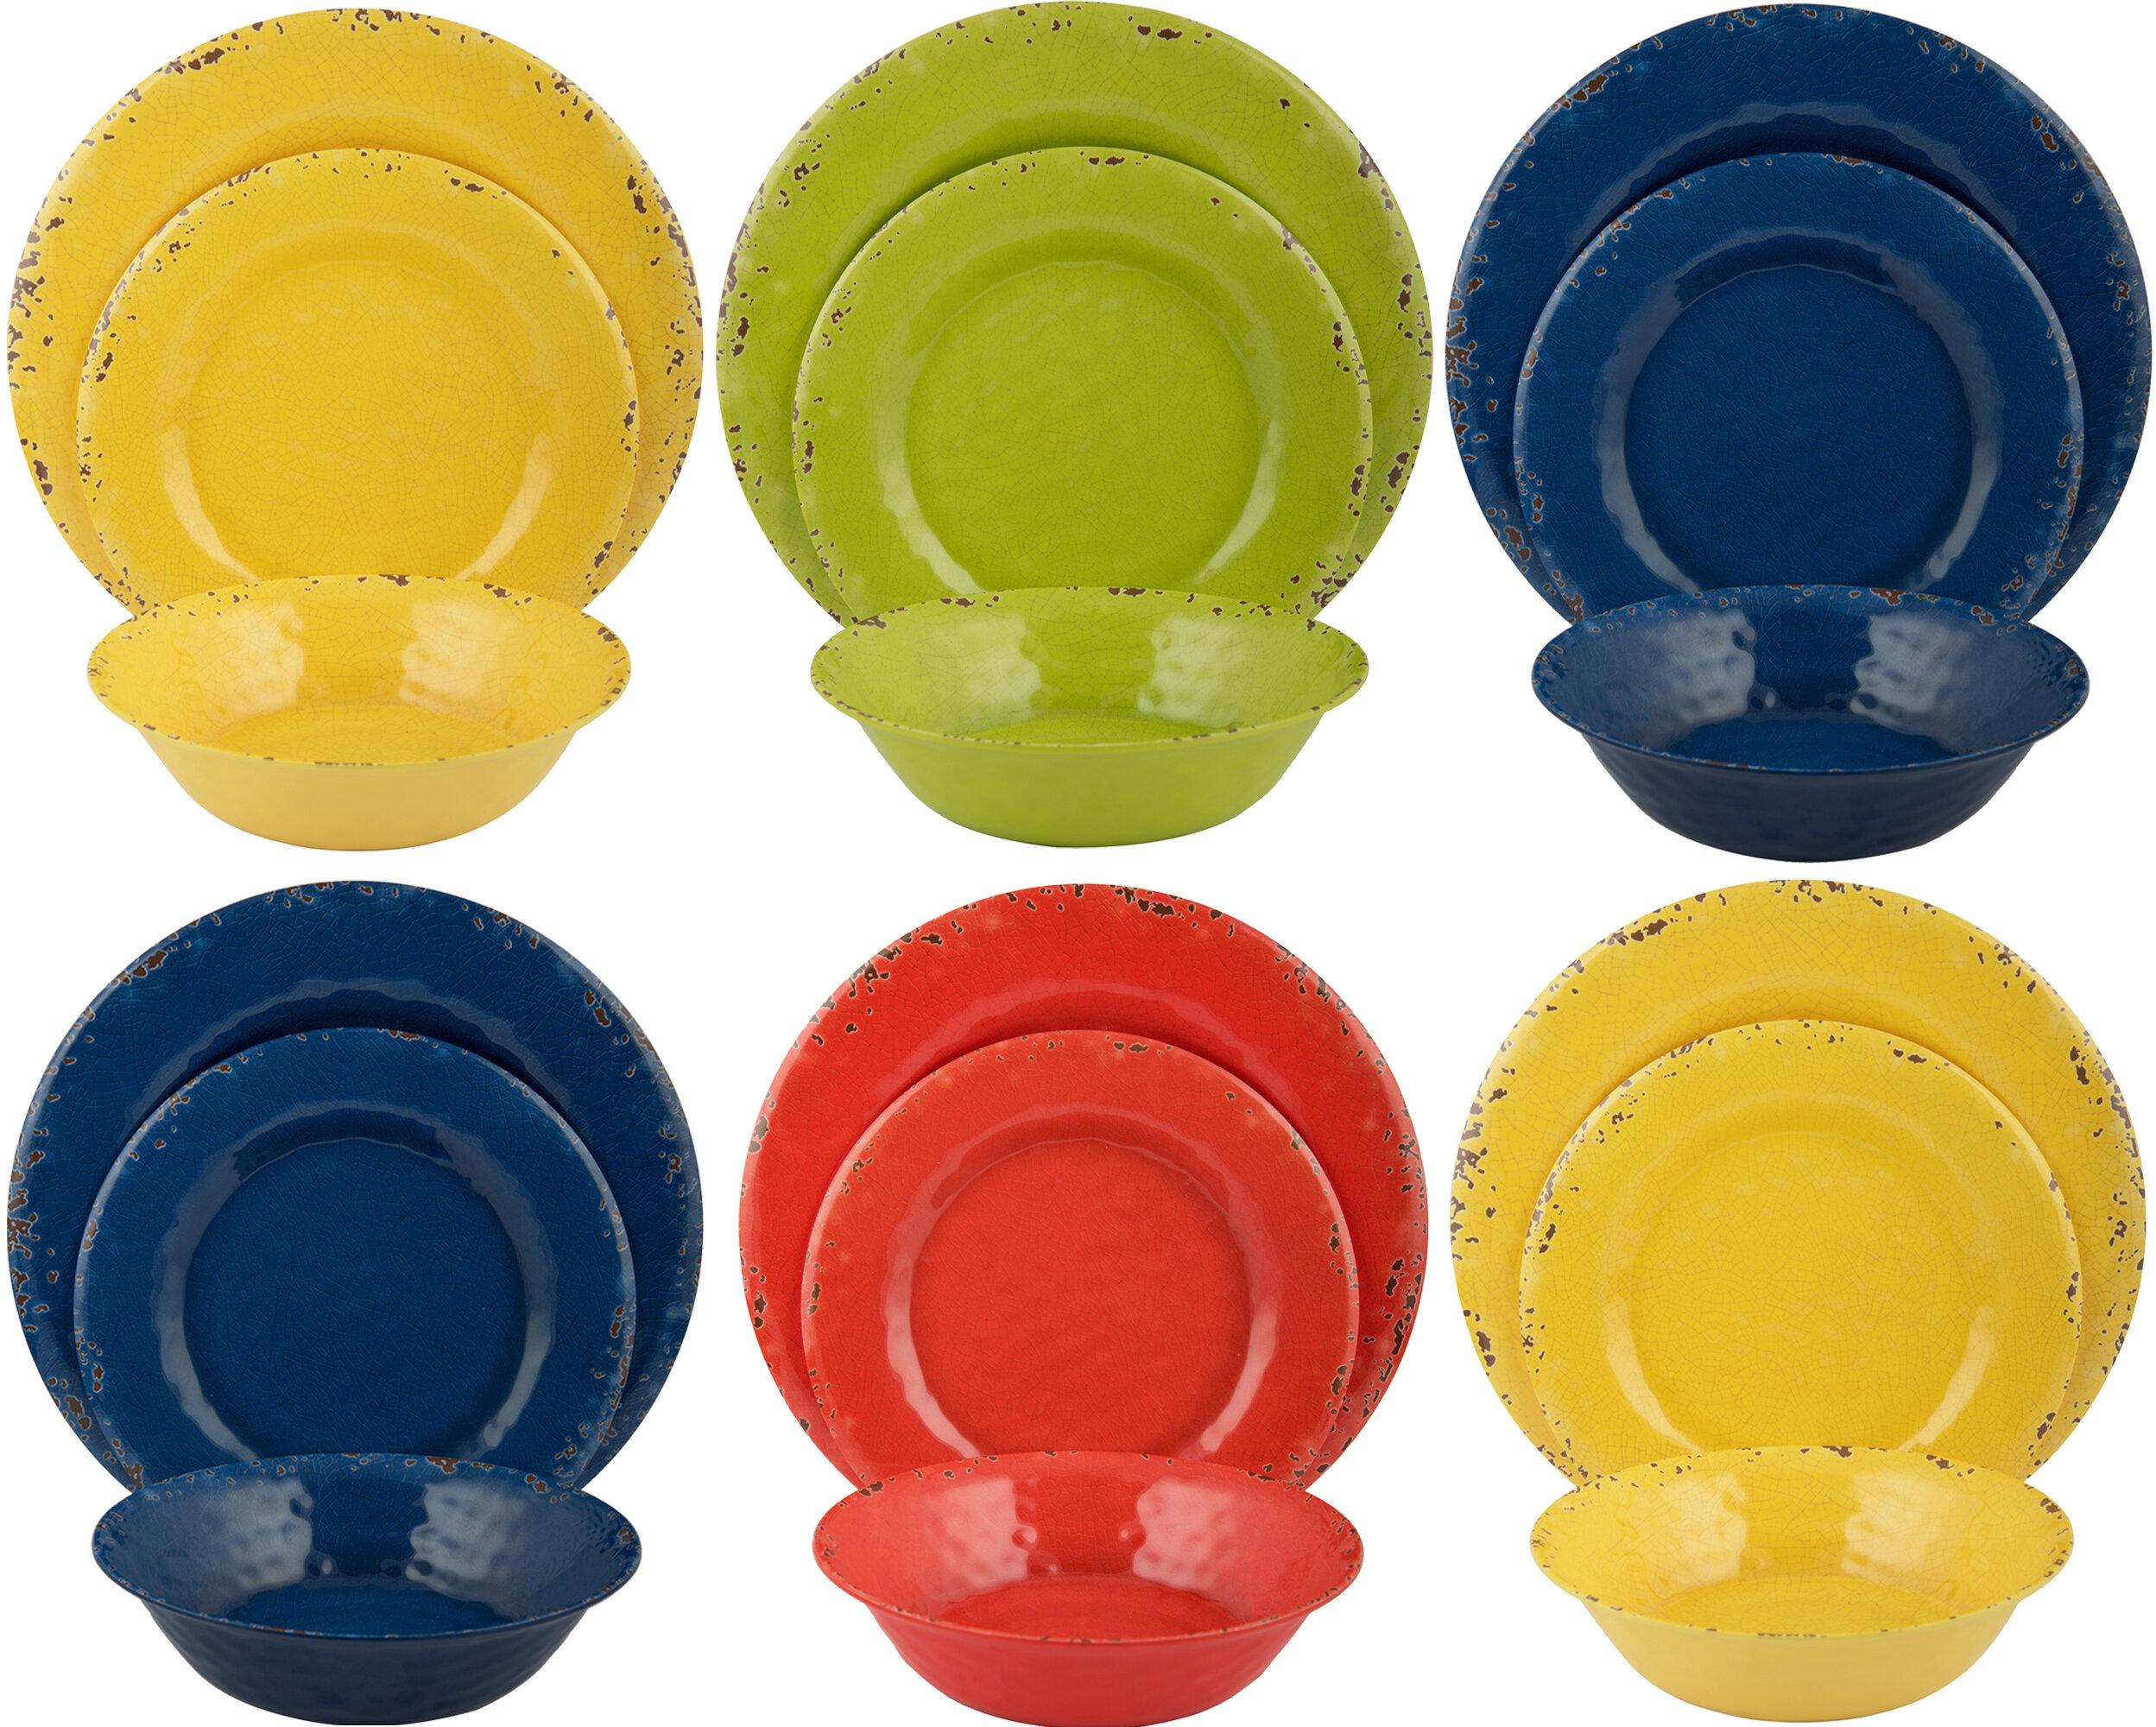 Table To Go Melange 18 Piece Melamine Dinnerware Set Service For 6 Reviews Wayfair